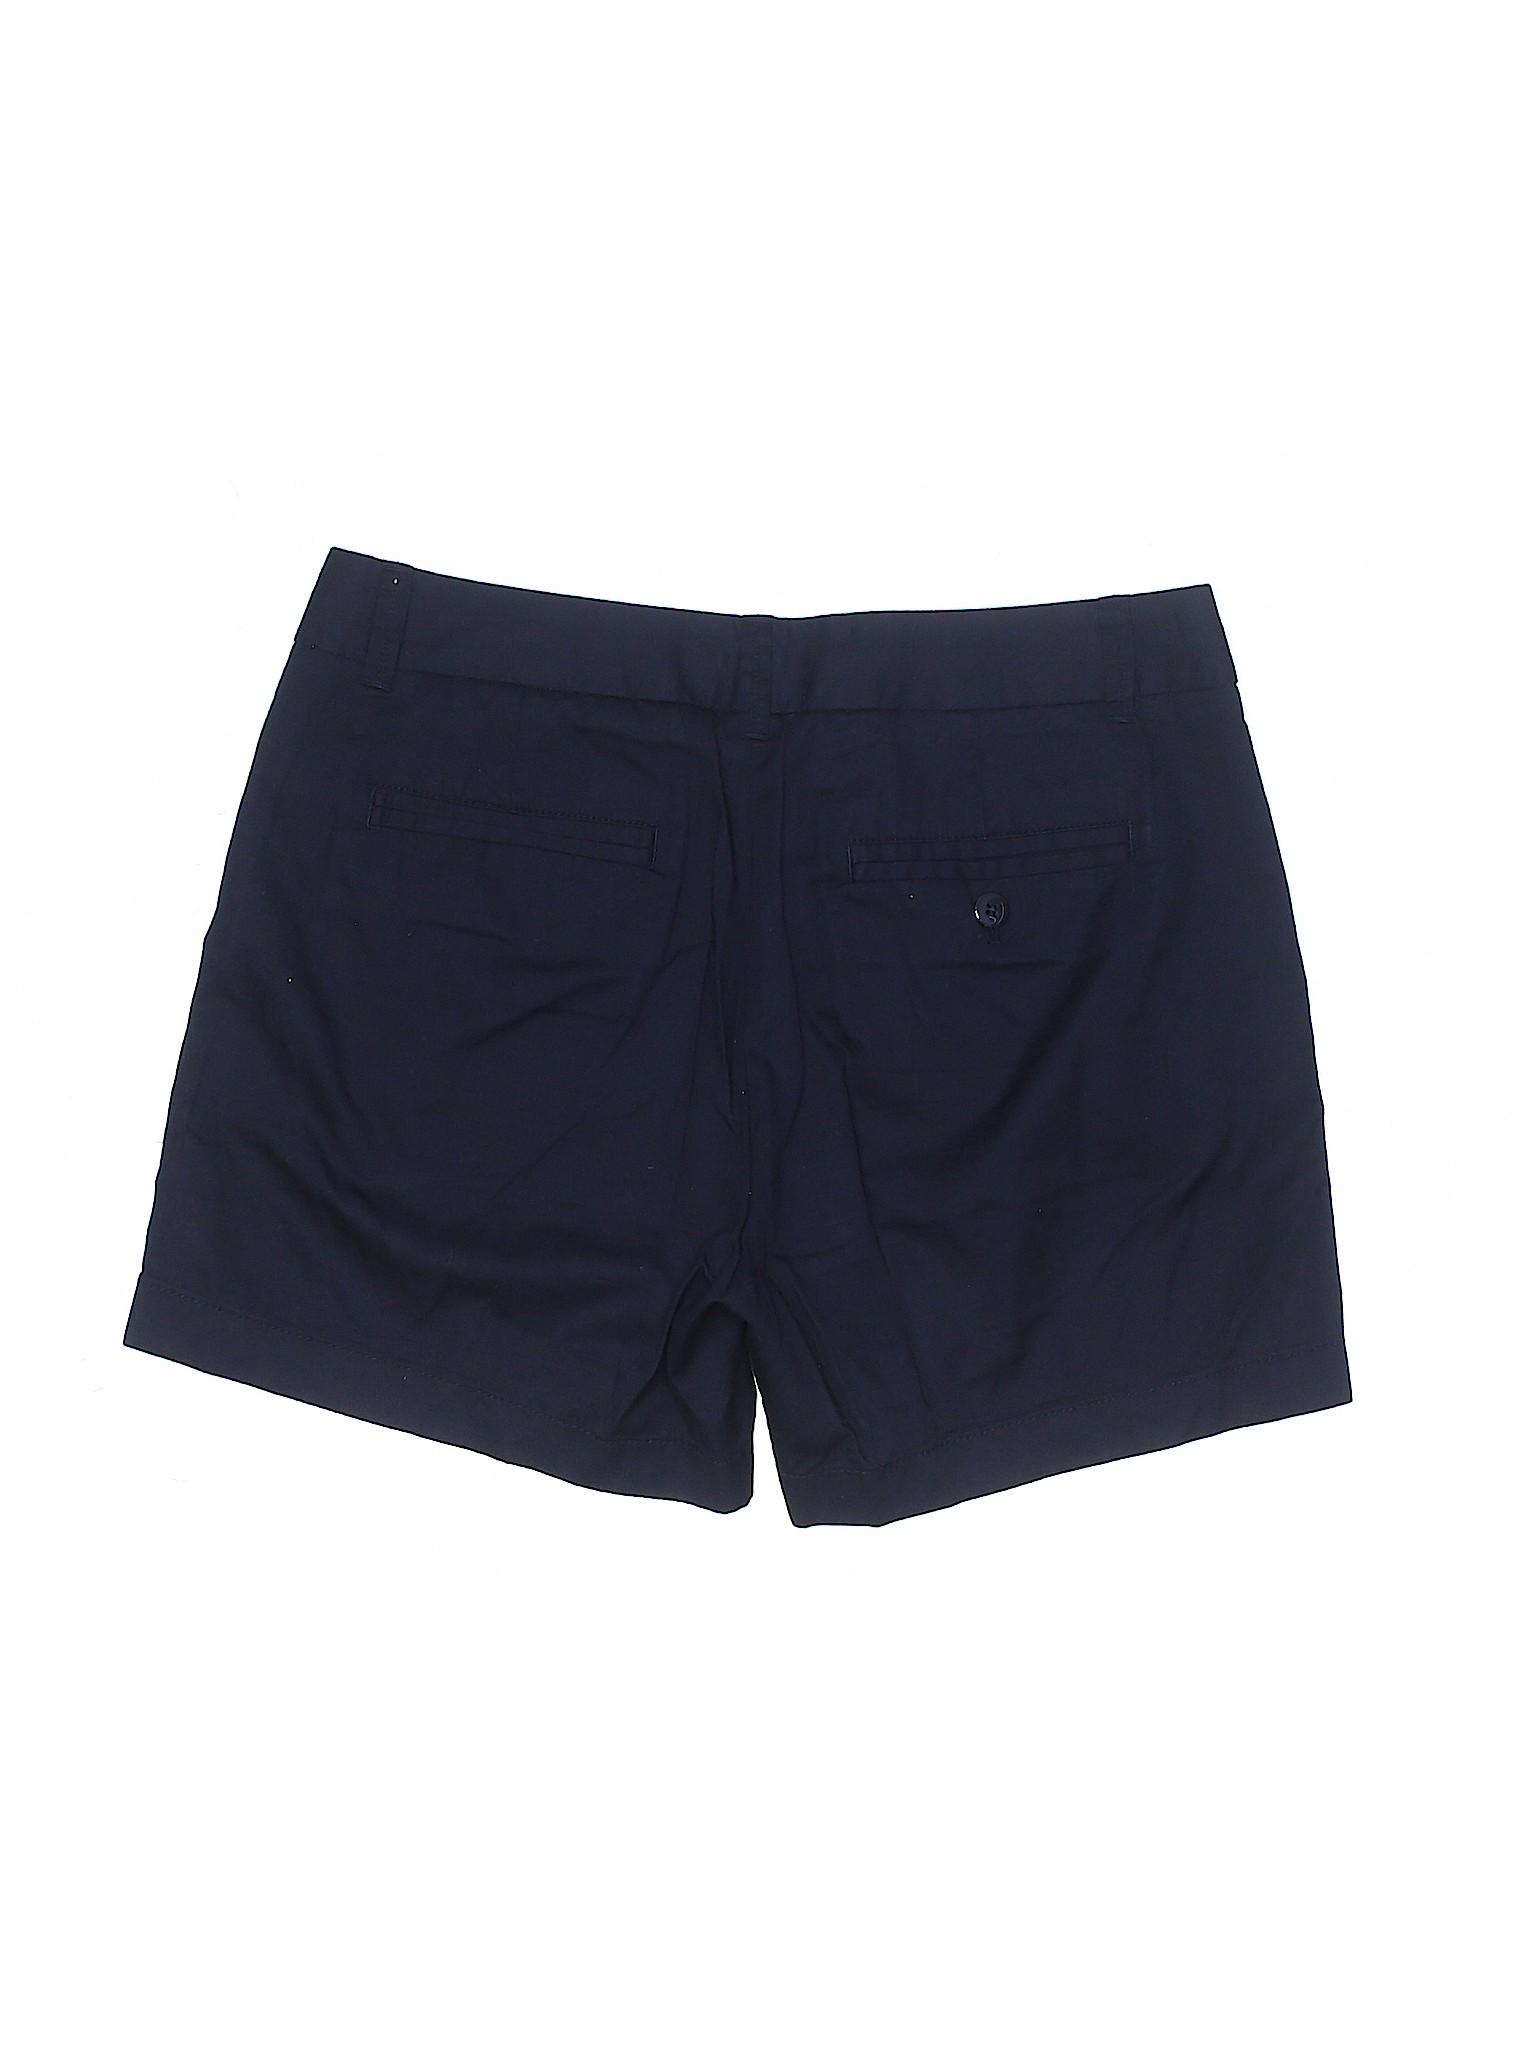 Boutique Crew leisure Shorts J Khaki xCUXq